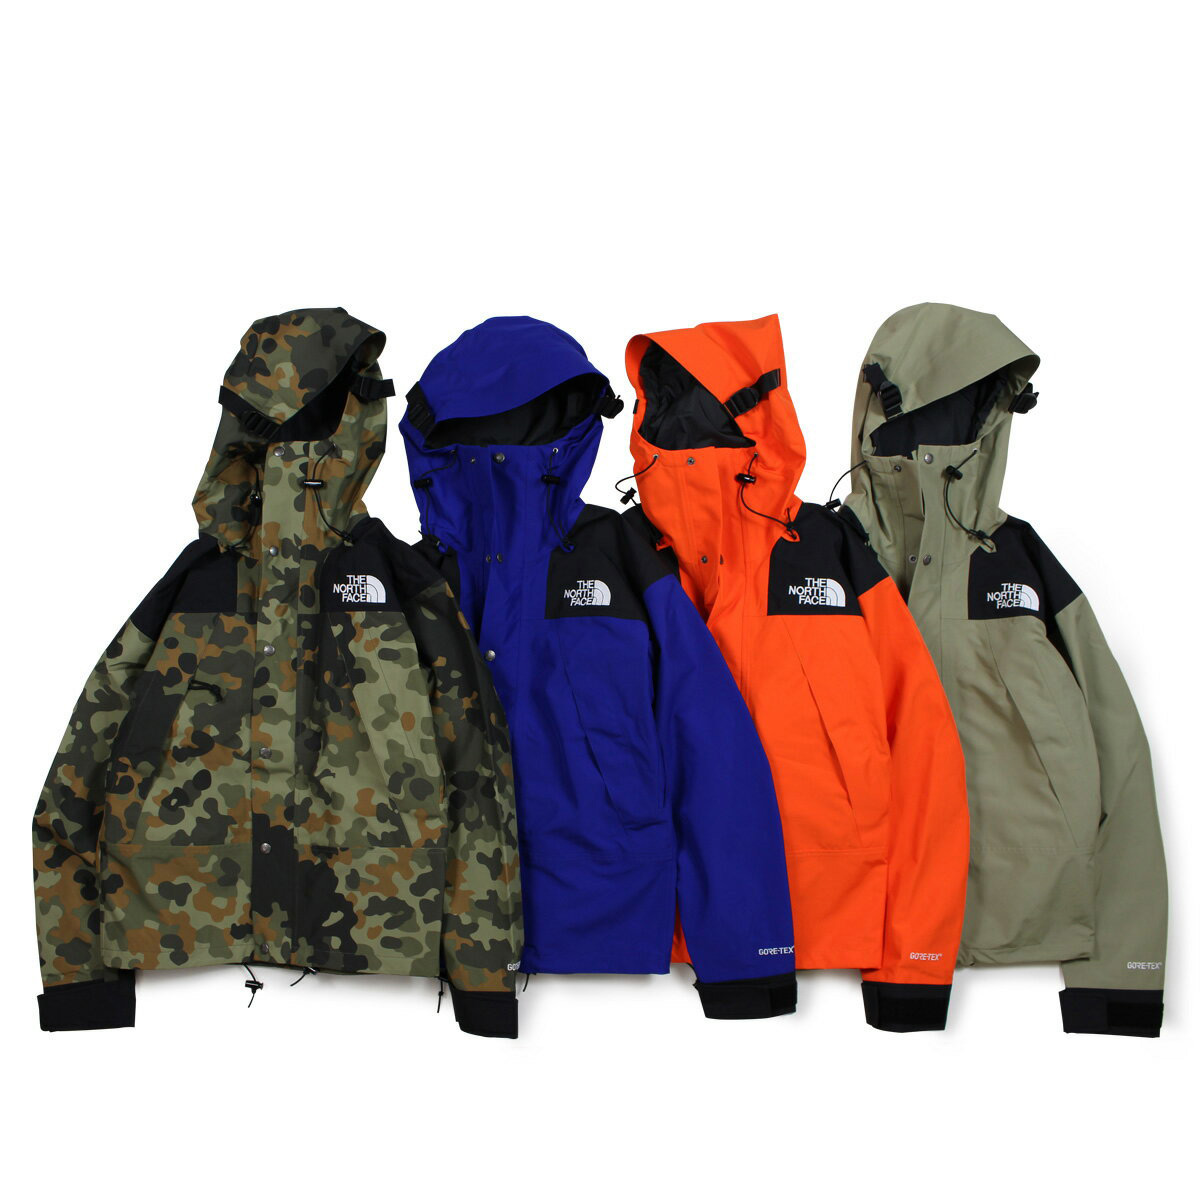 f9a3fa5ef THE NORTH FACE MENS 1990 MOUNTAIN JACKET GTX North Face jacket Gore-Tex  mountain jacket men NF0A3JPA